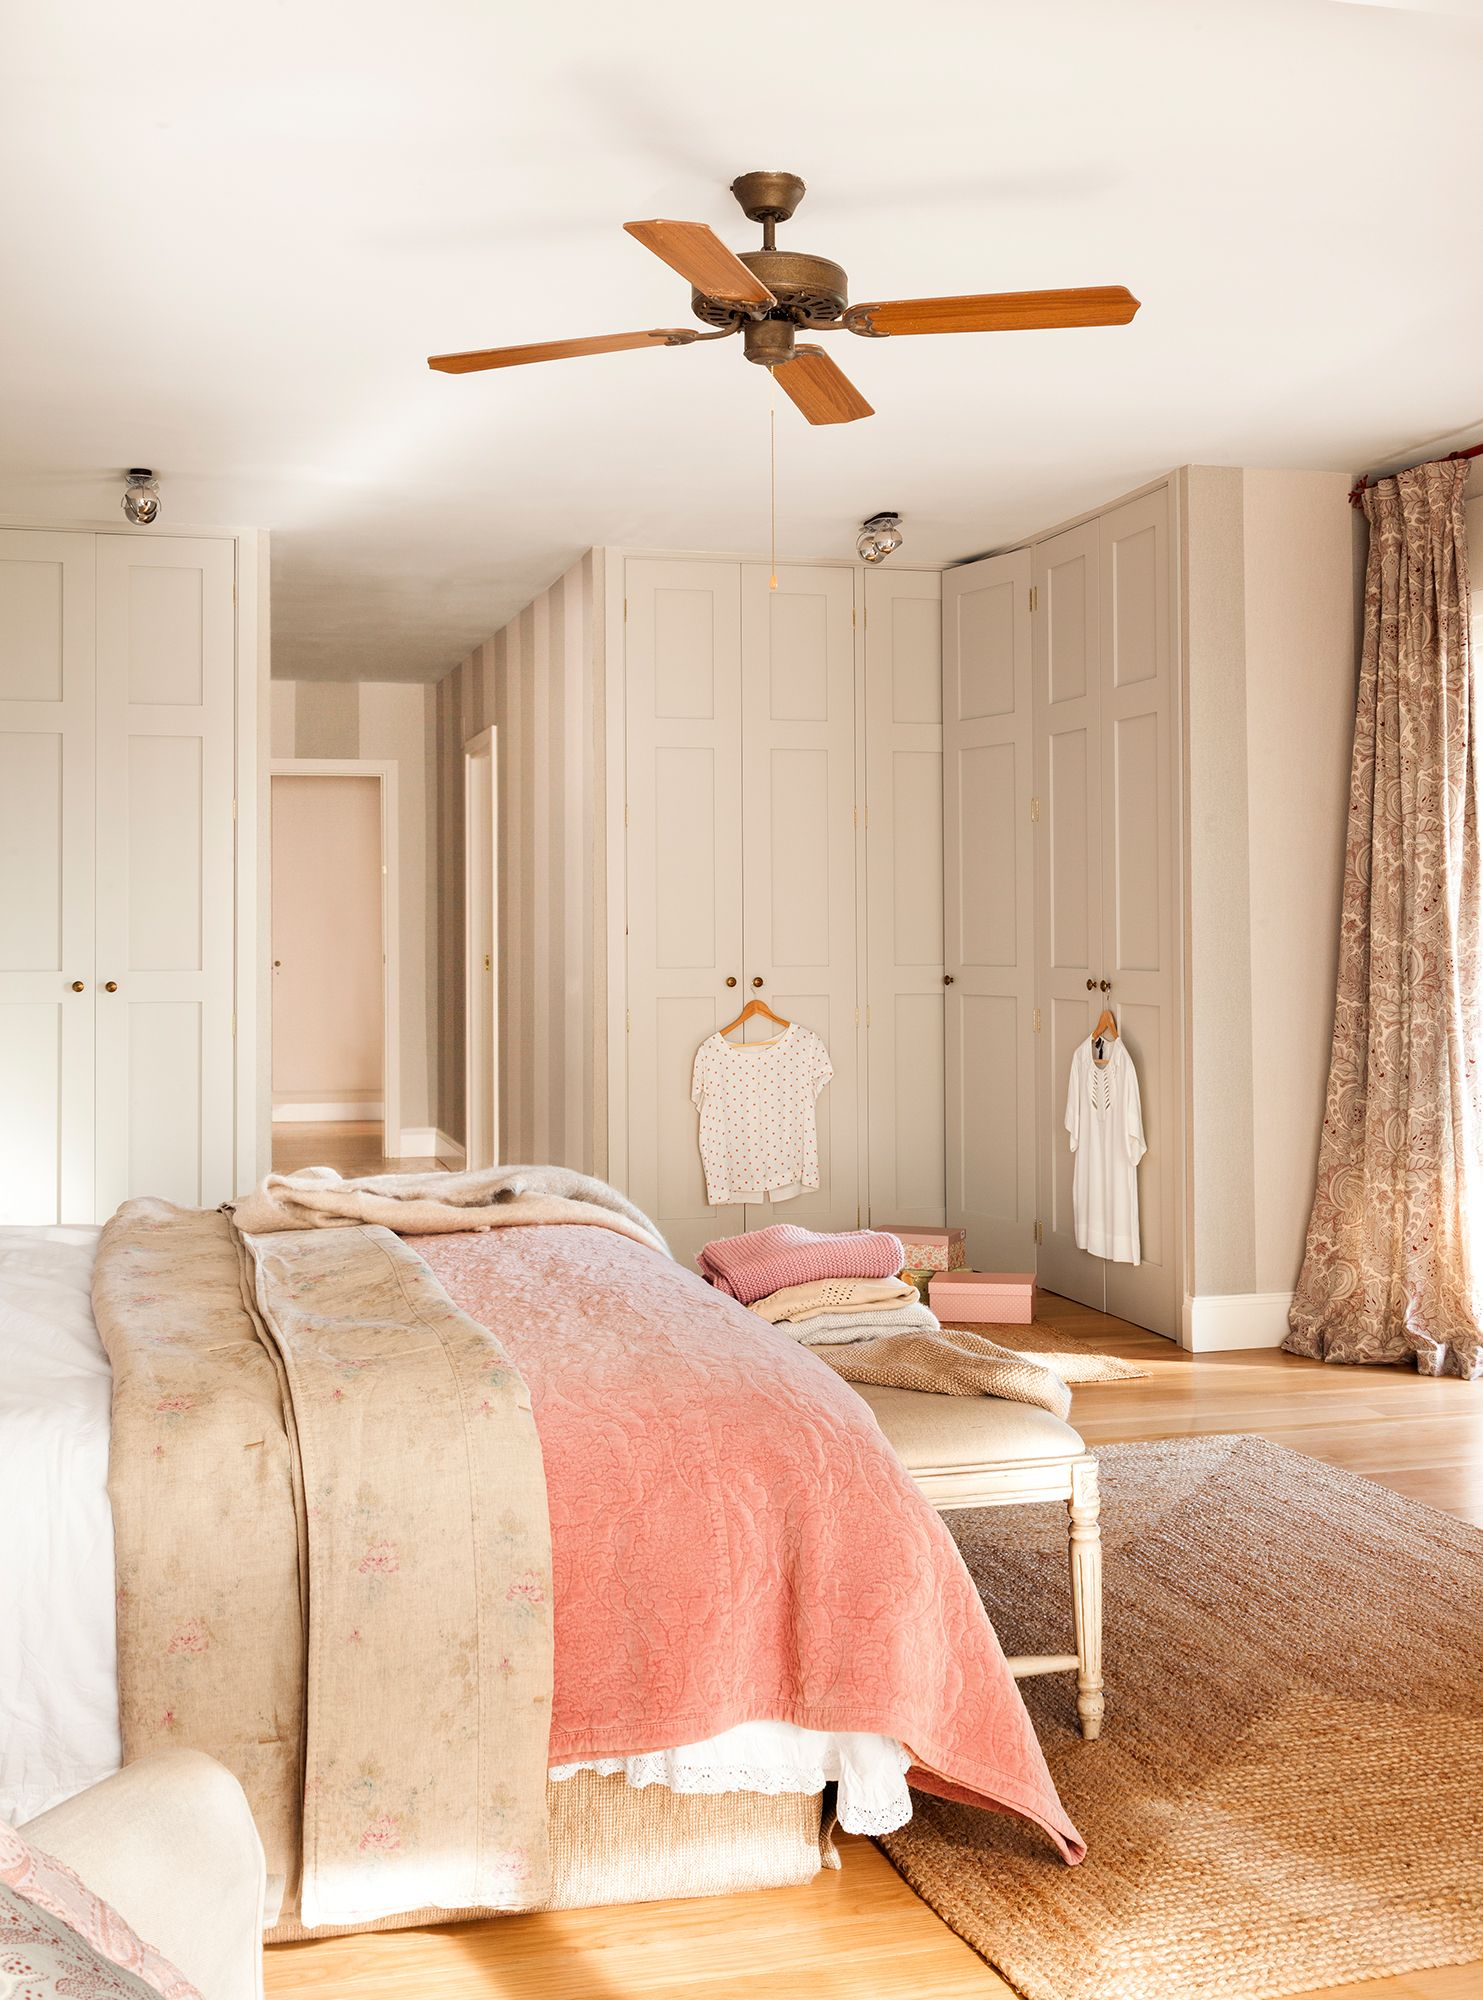 46 dos armarios sim tricos en l bedroom designs inspiration rh pinterest com